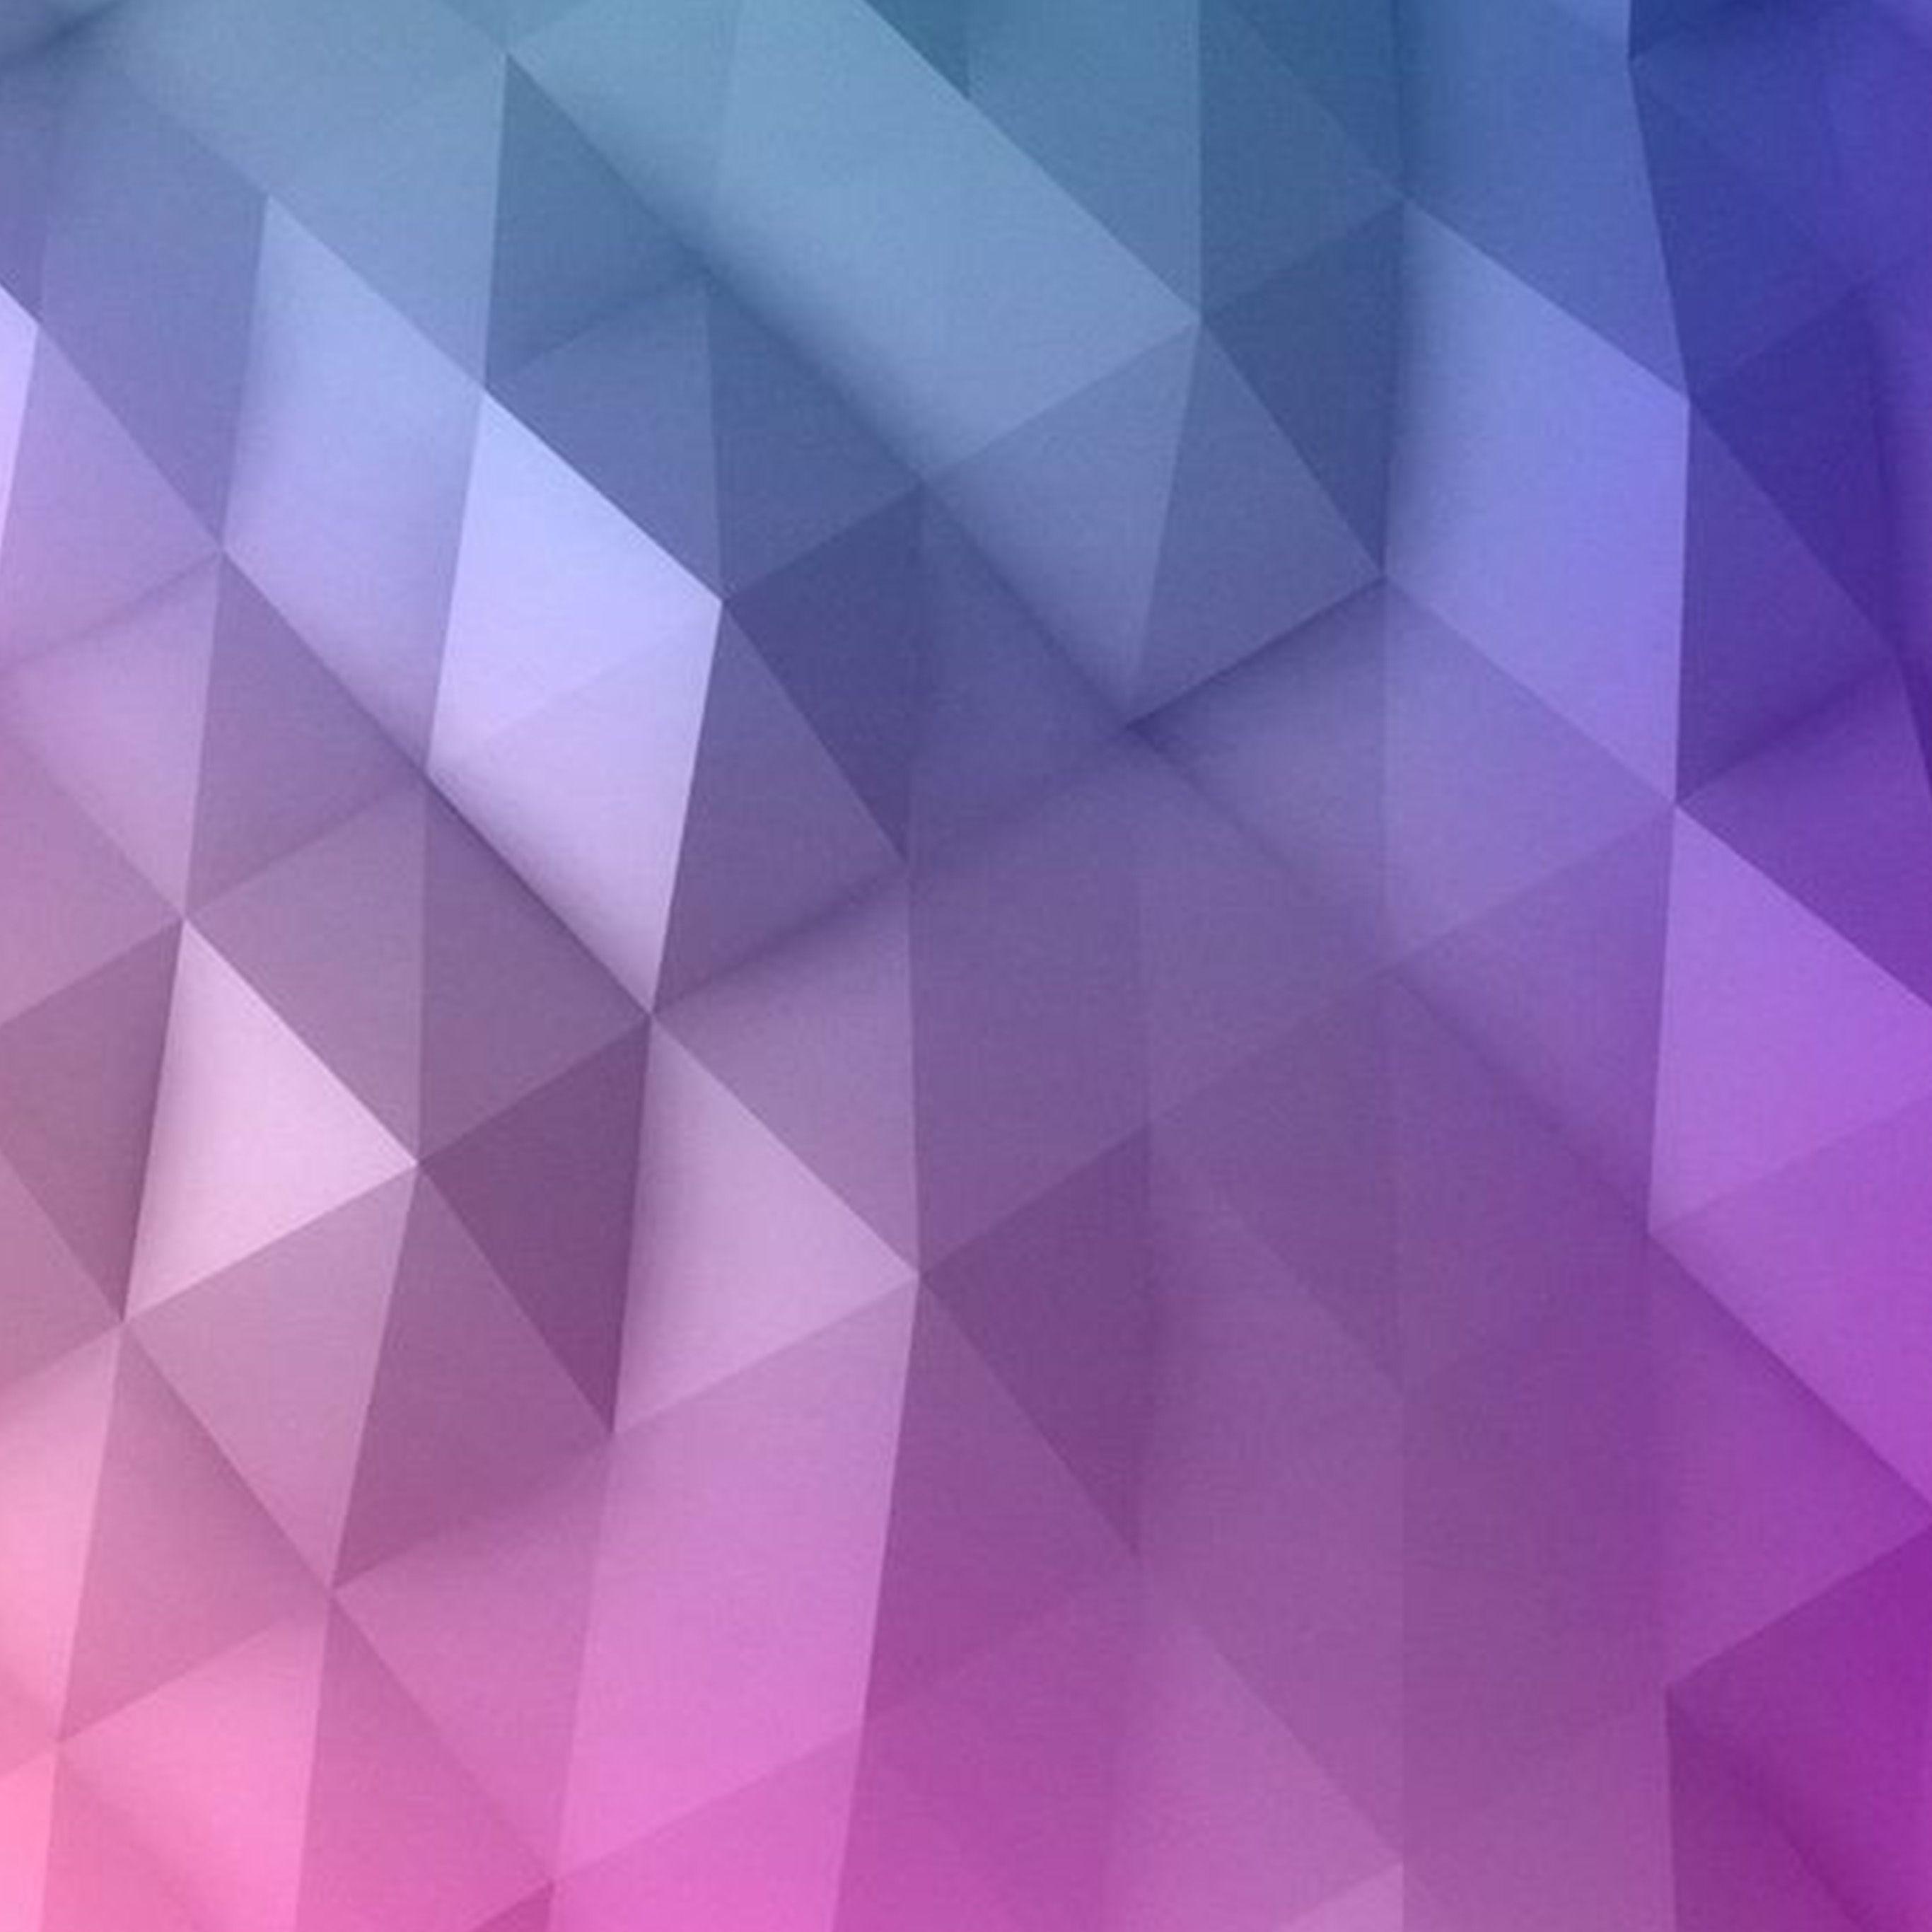 4K 3D Geometric Wallpapers